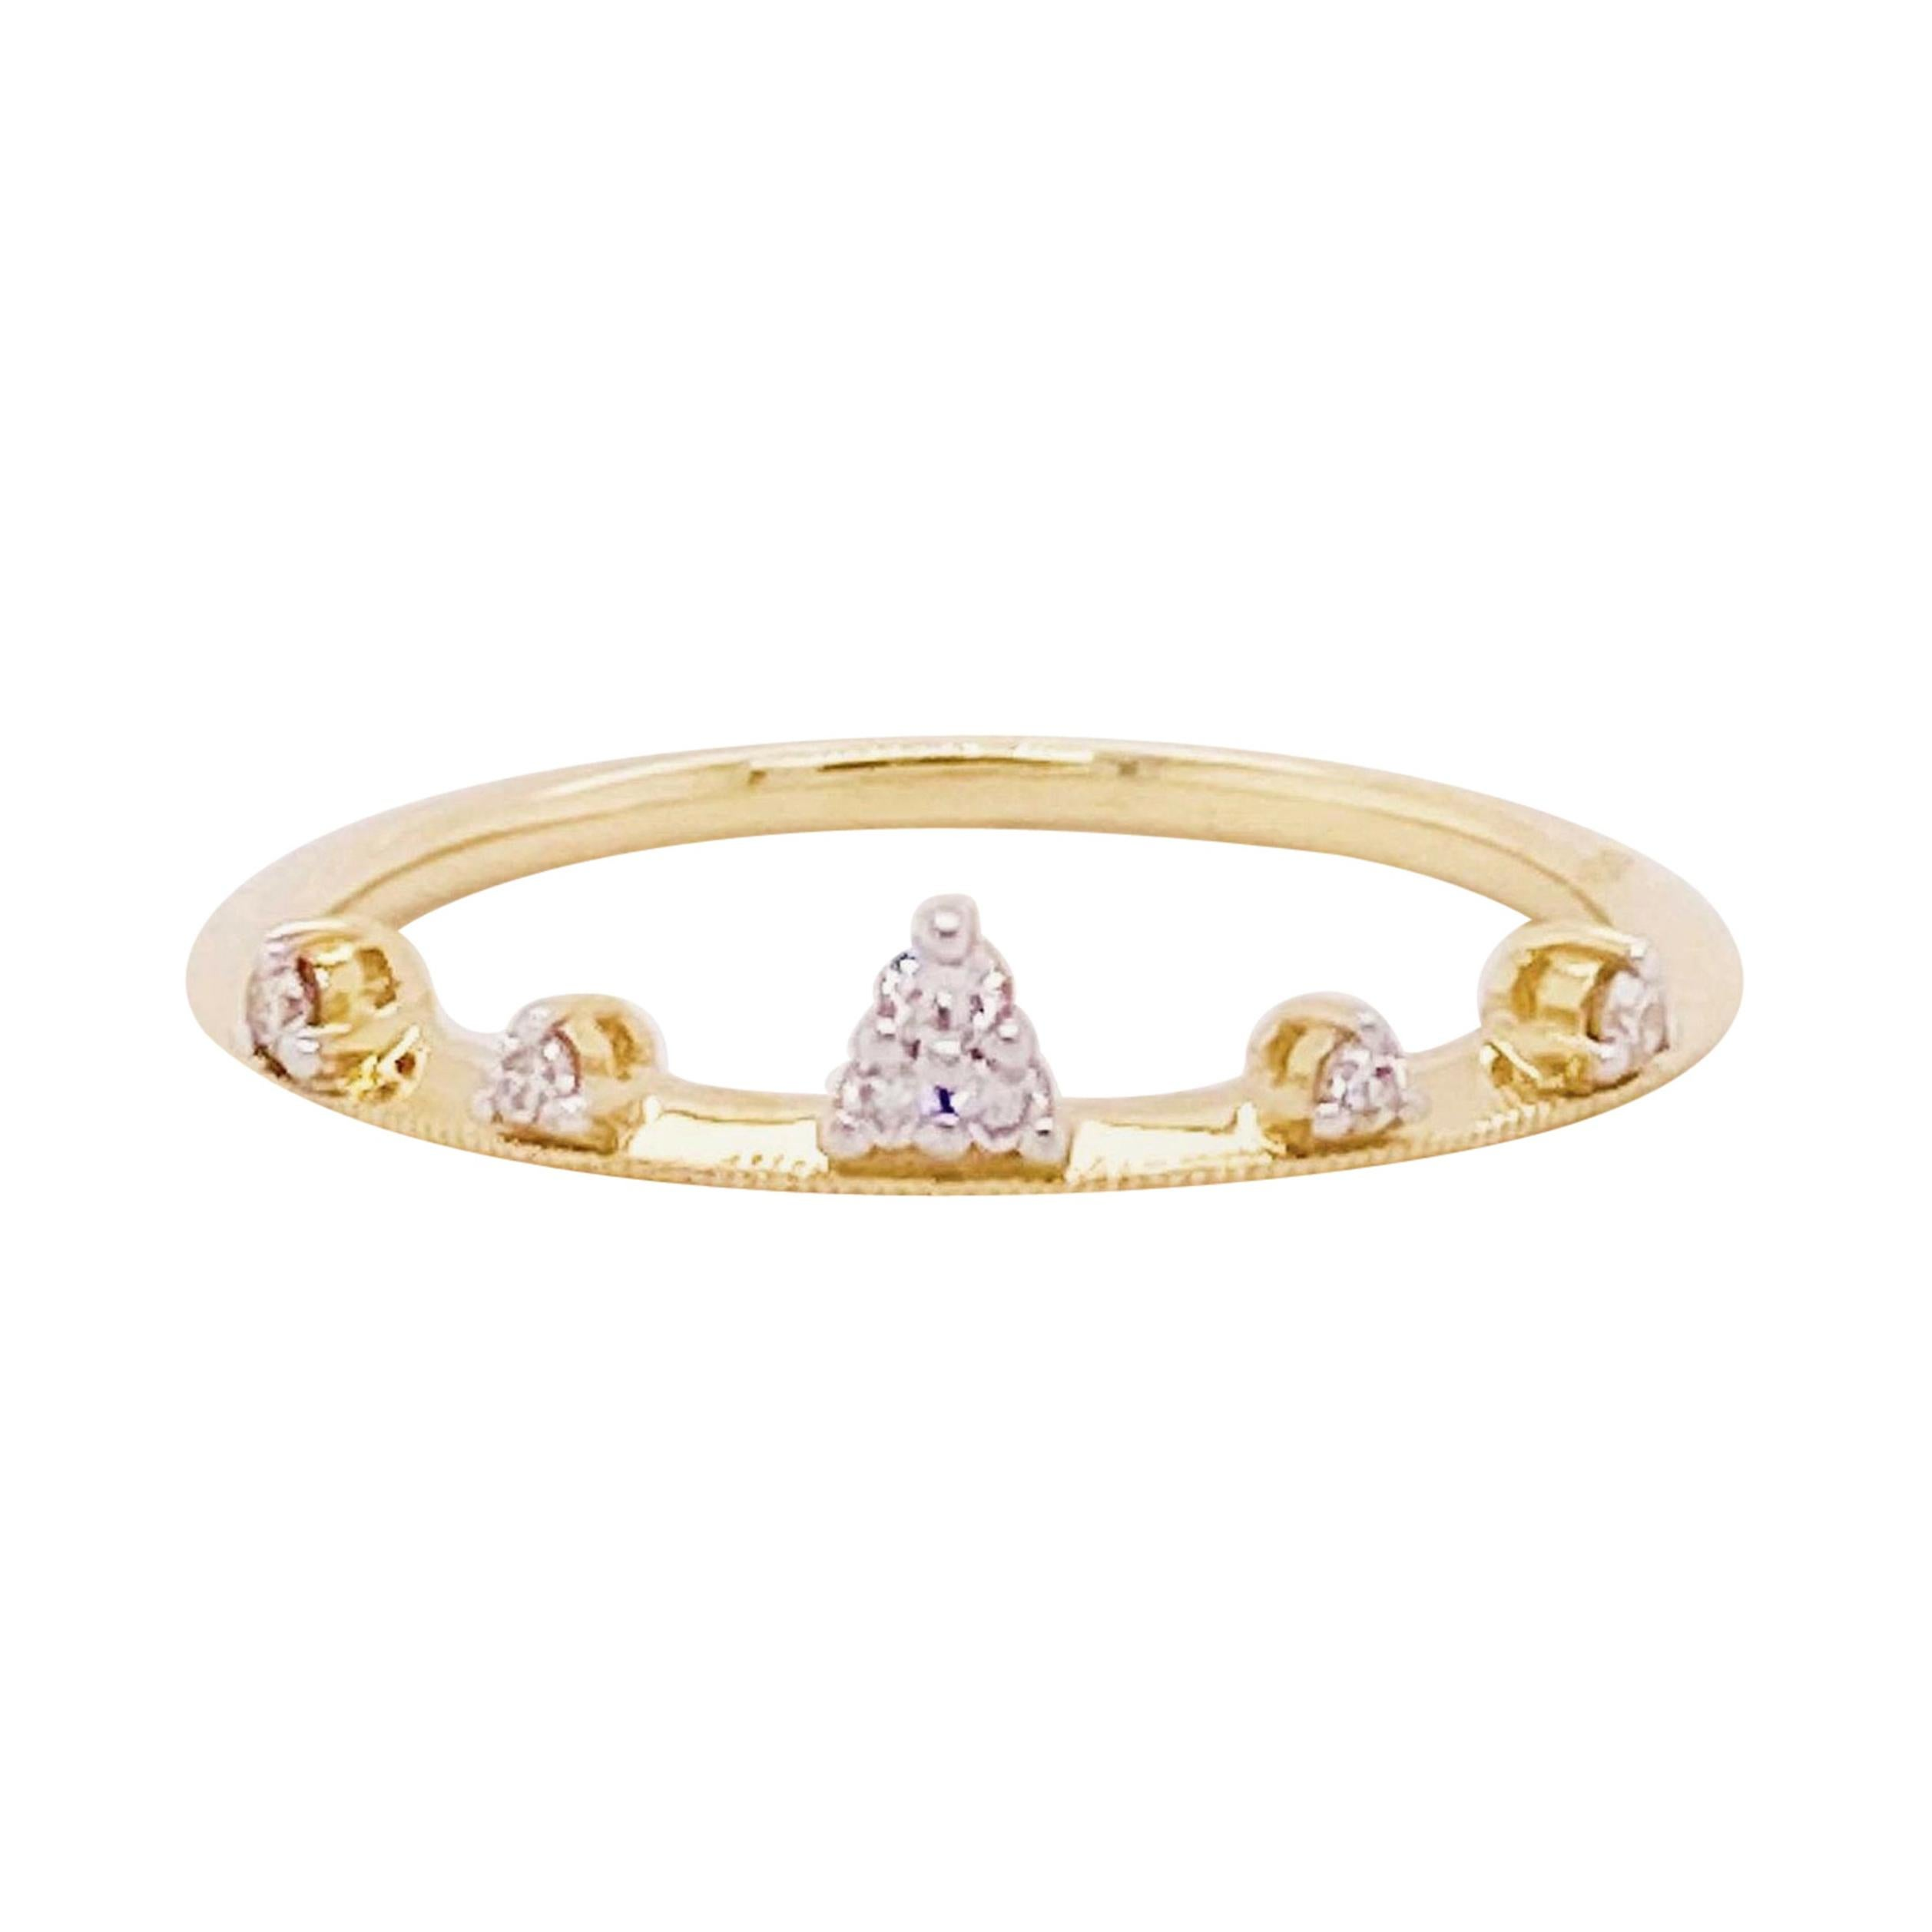 Diamond Tiara Band 14 Karat Yellow Gold Round Diamond Fashion Band Crown Design